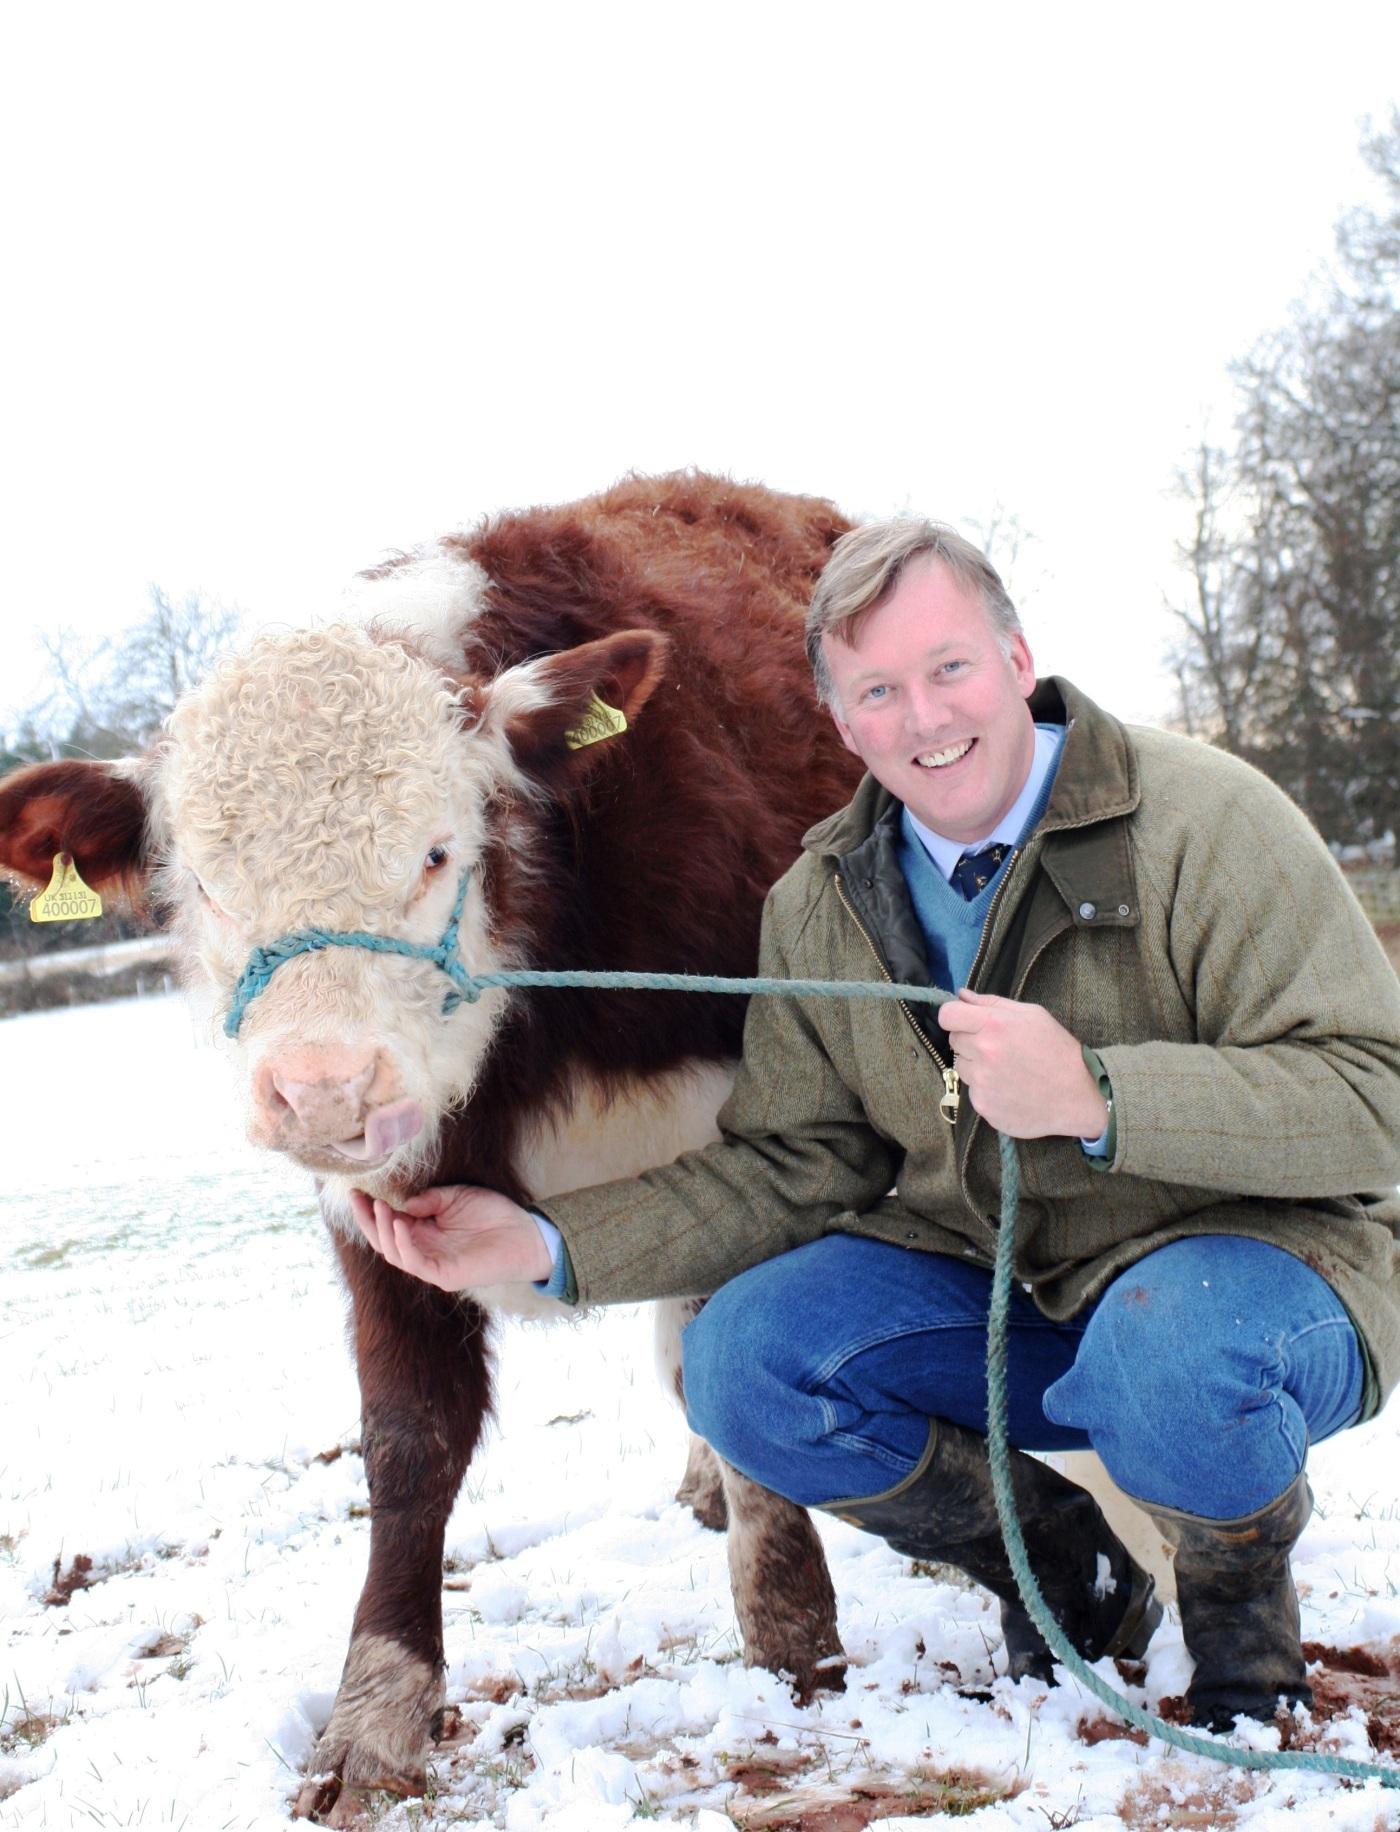 Bill with Calf